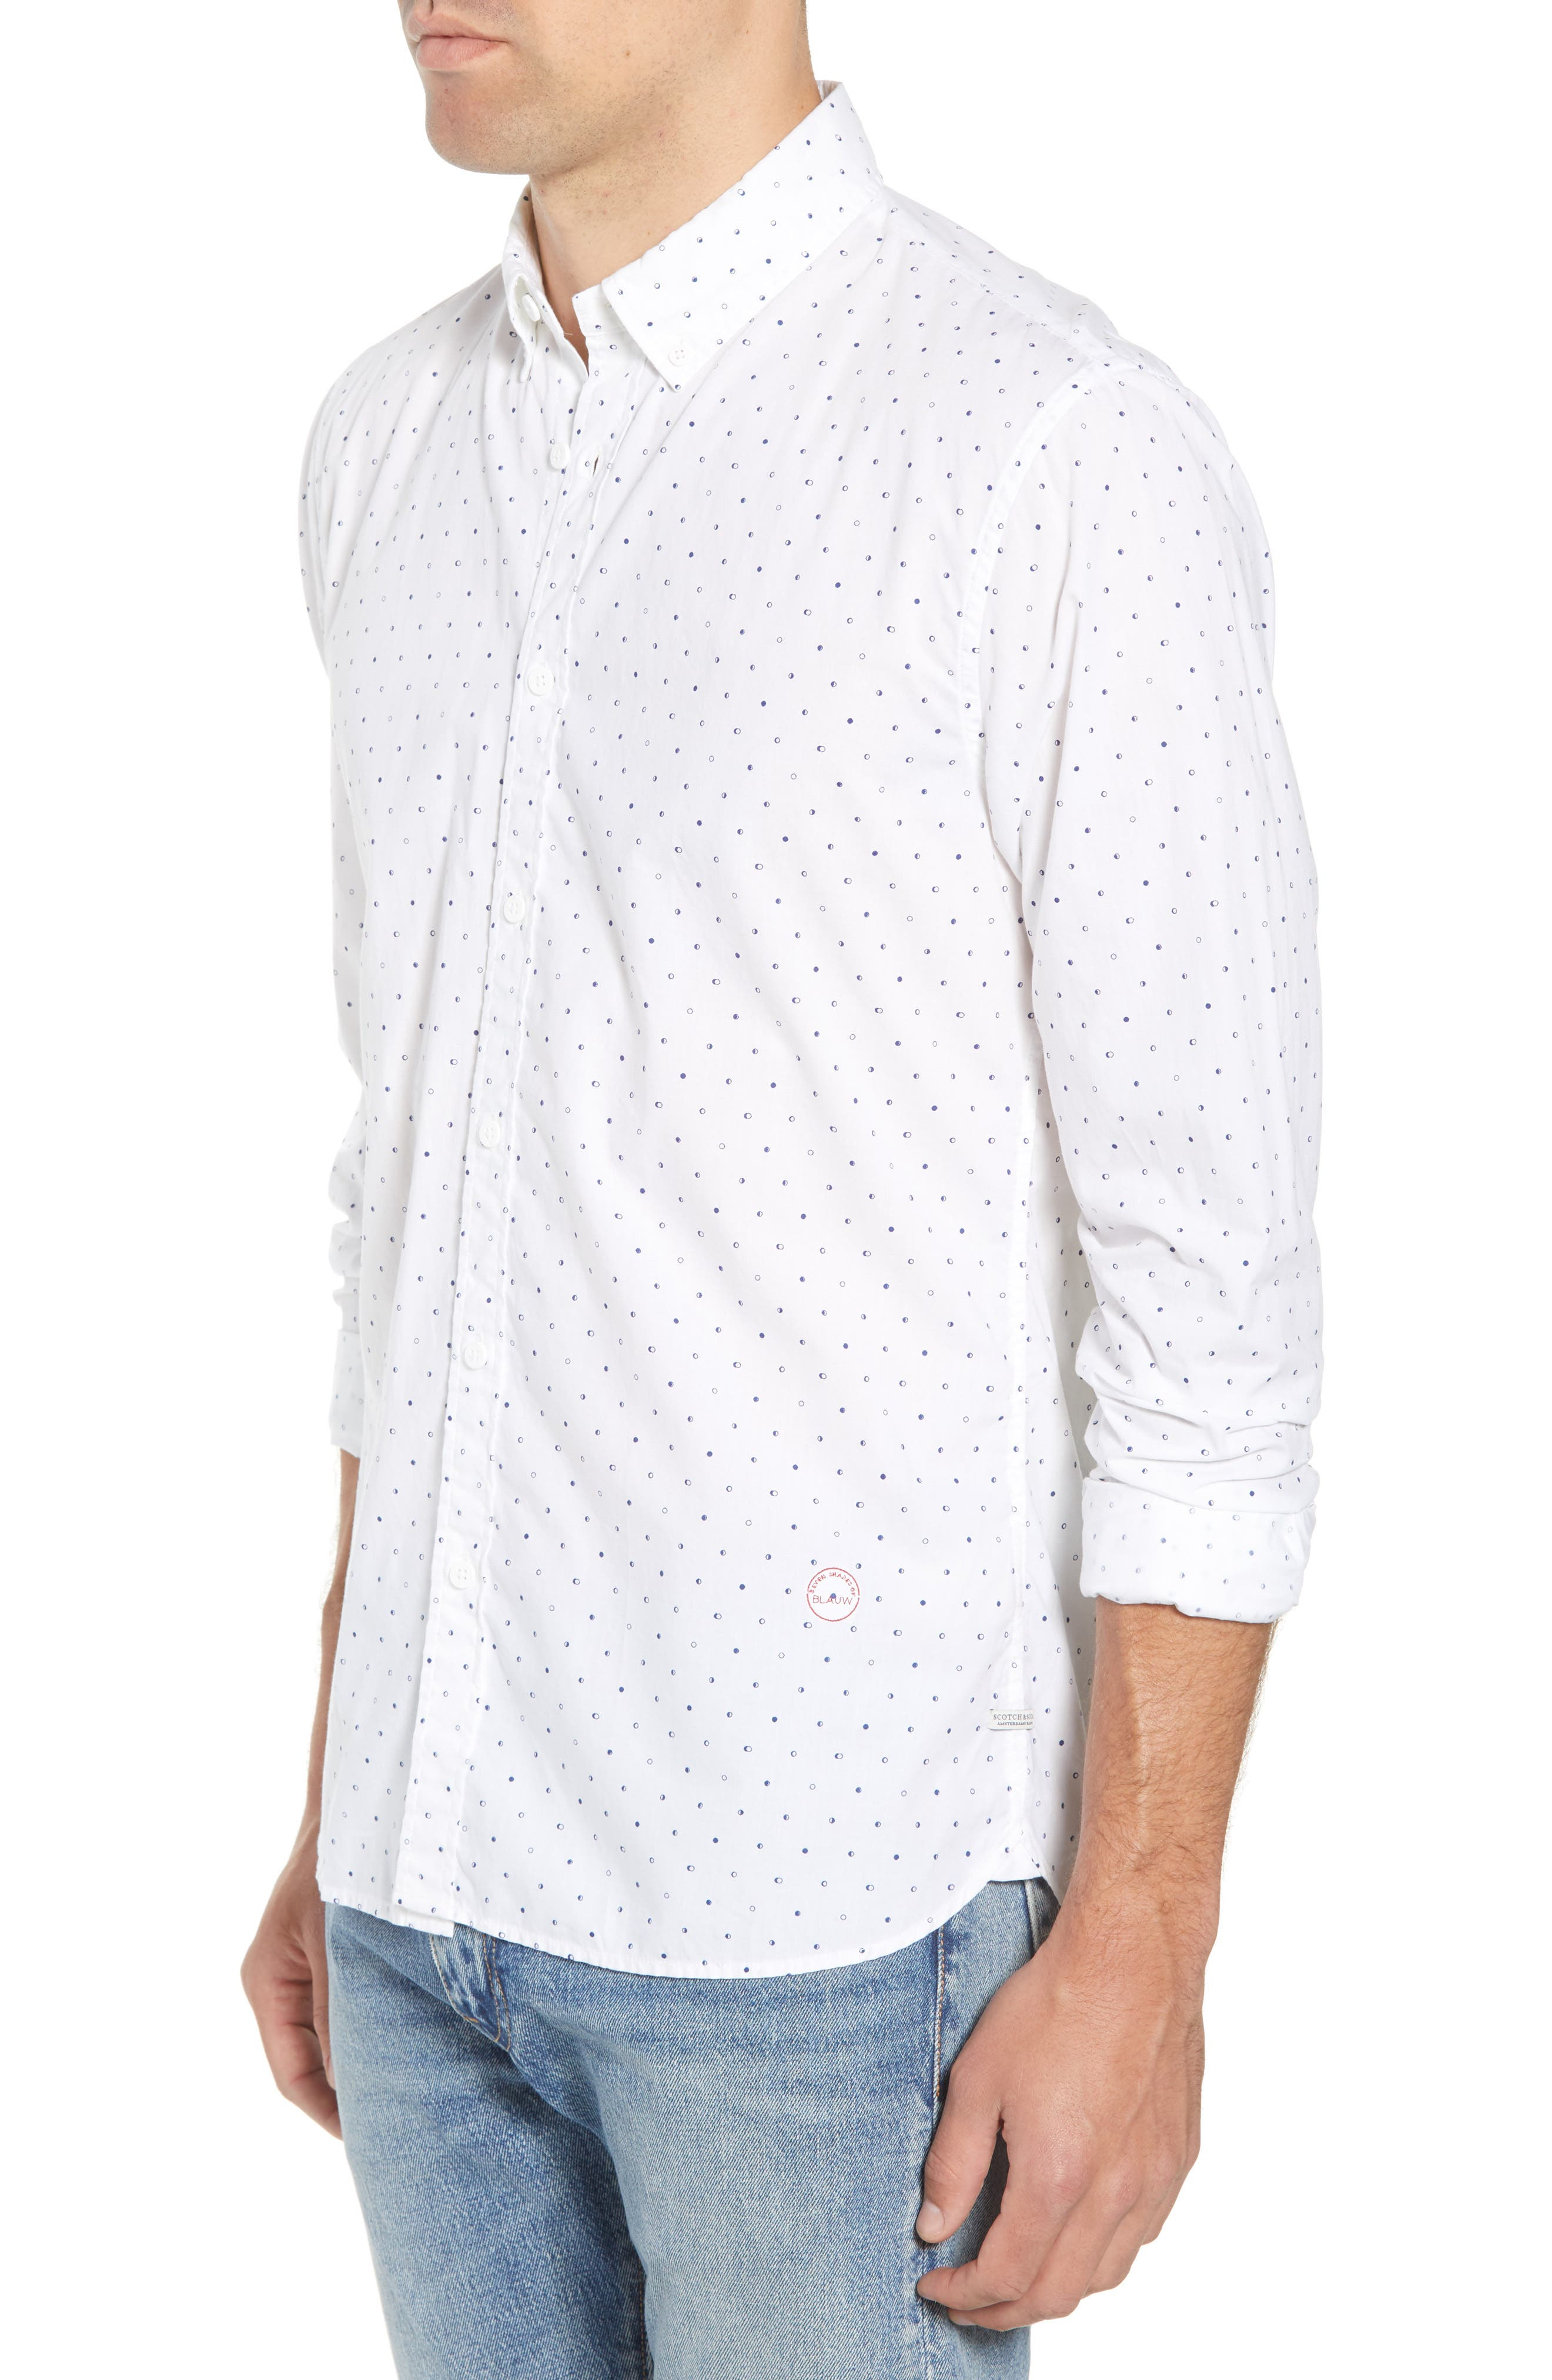 Amsterdams Blauw Simple Light Print Sport Shirt,                             Alternate thumbnail 3, color,                             110